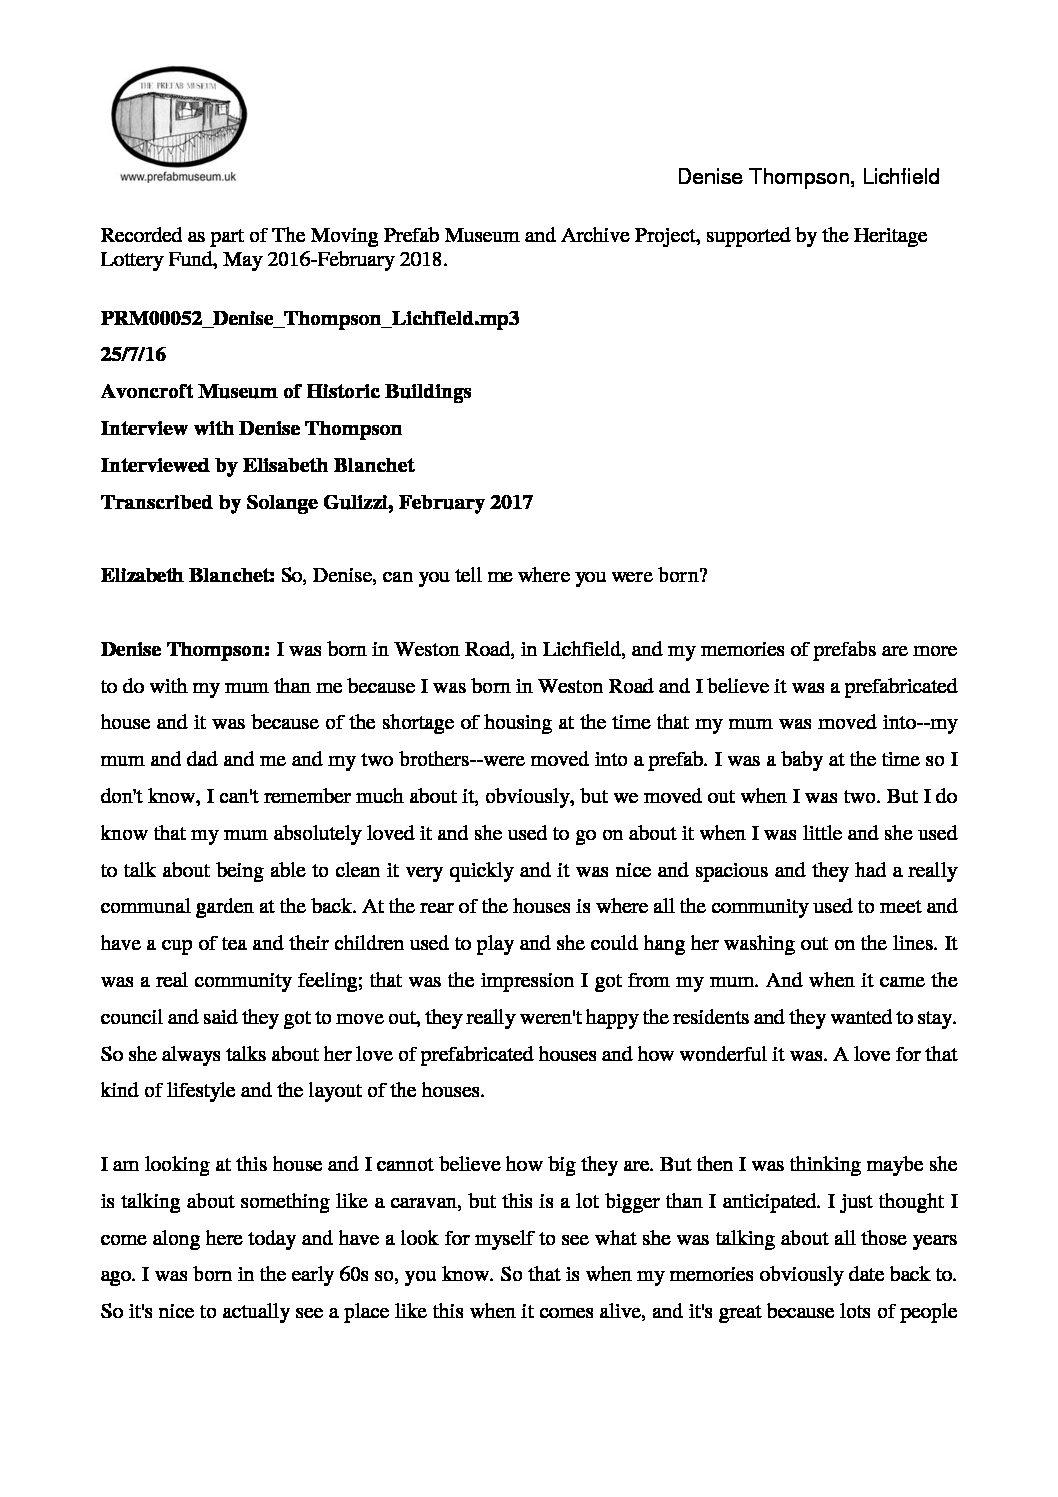 Transcription of Denise Thompson's interview